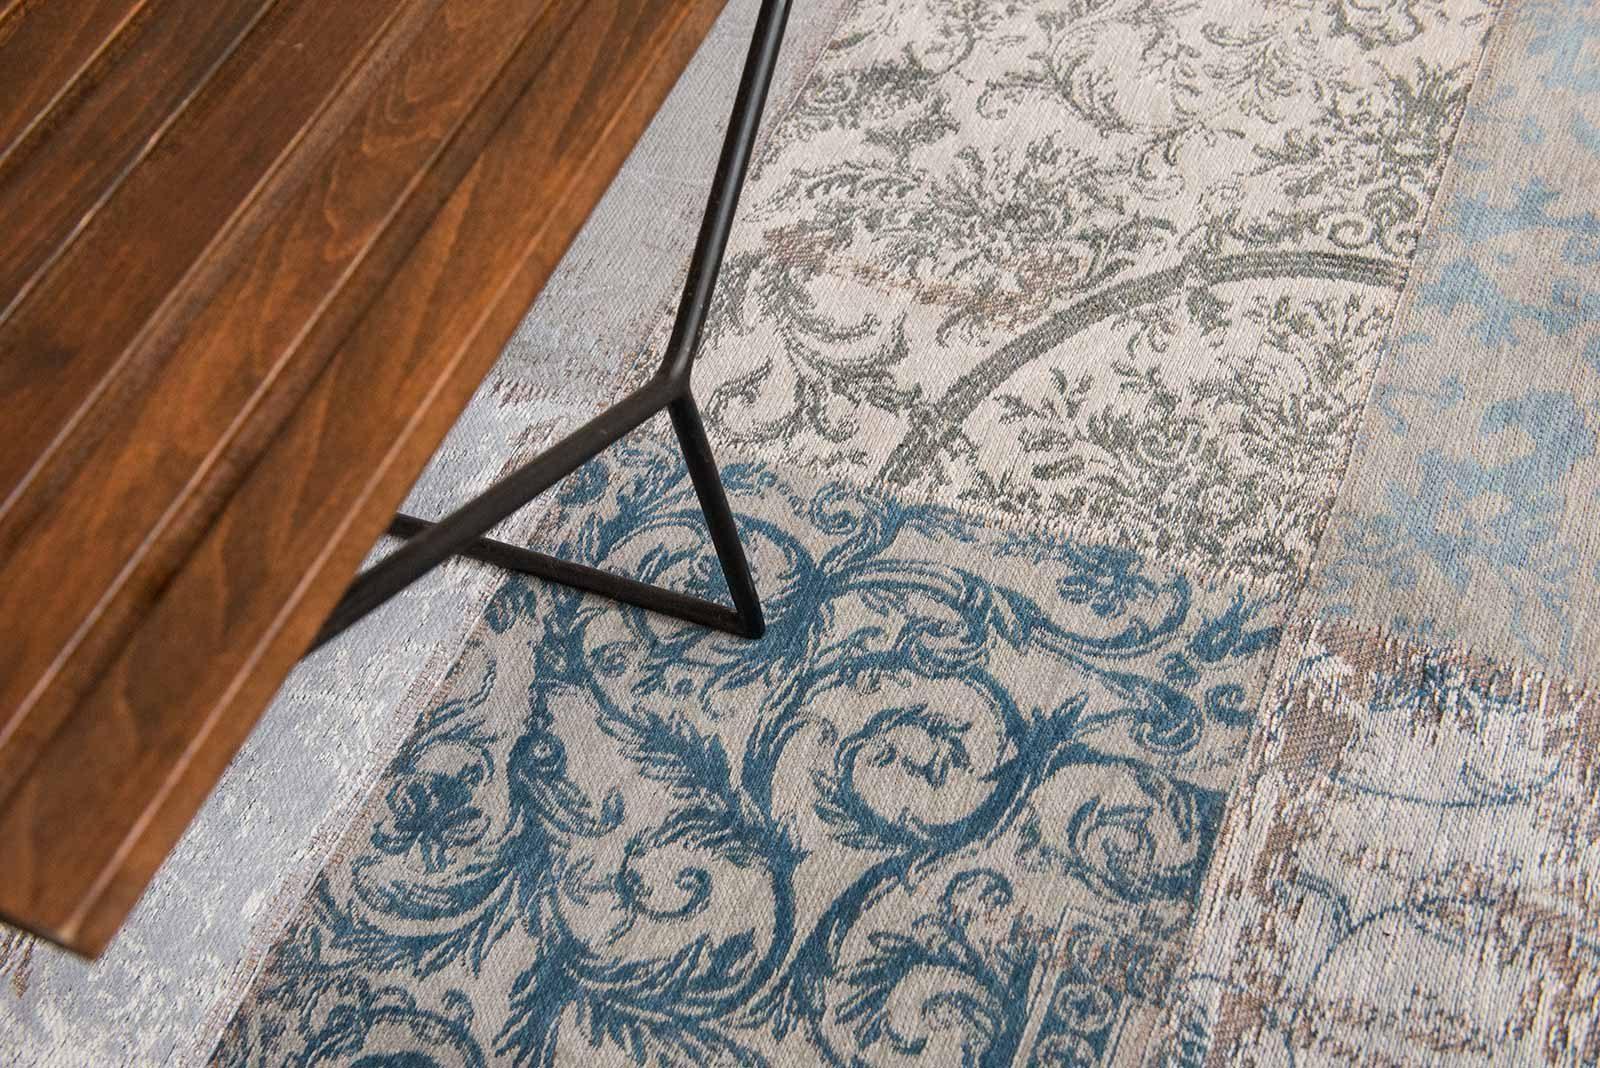 tapijt Louis De Poortere LX8981 Vintage Bruges Blue zoom 3